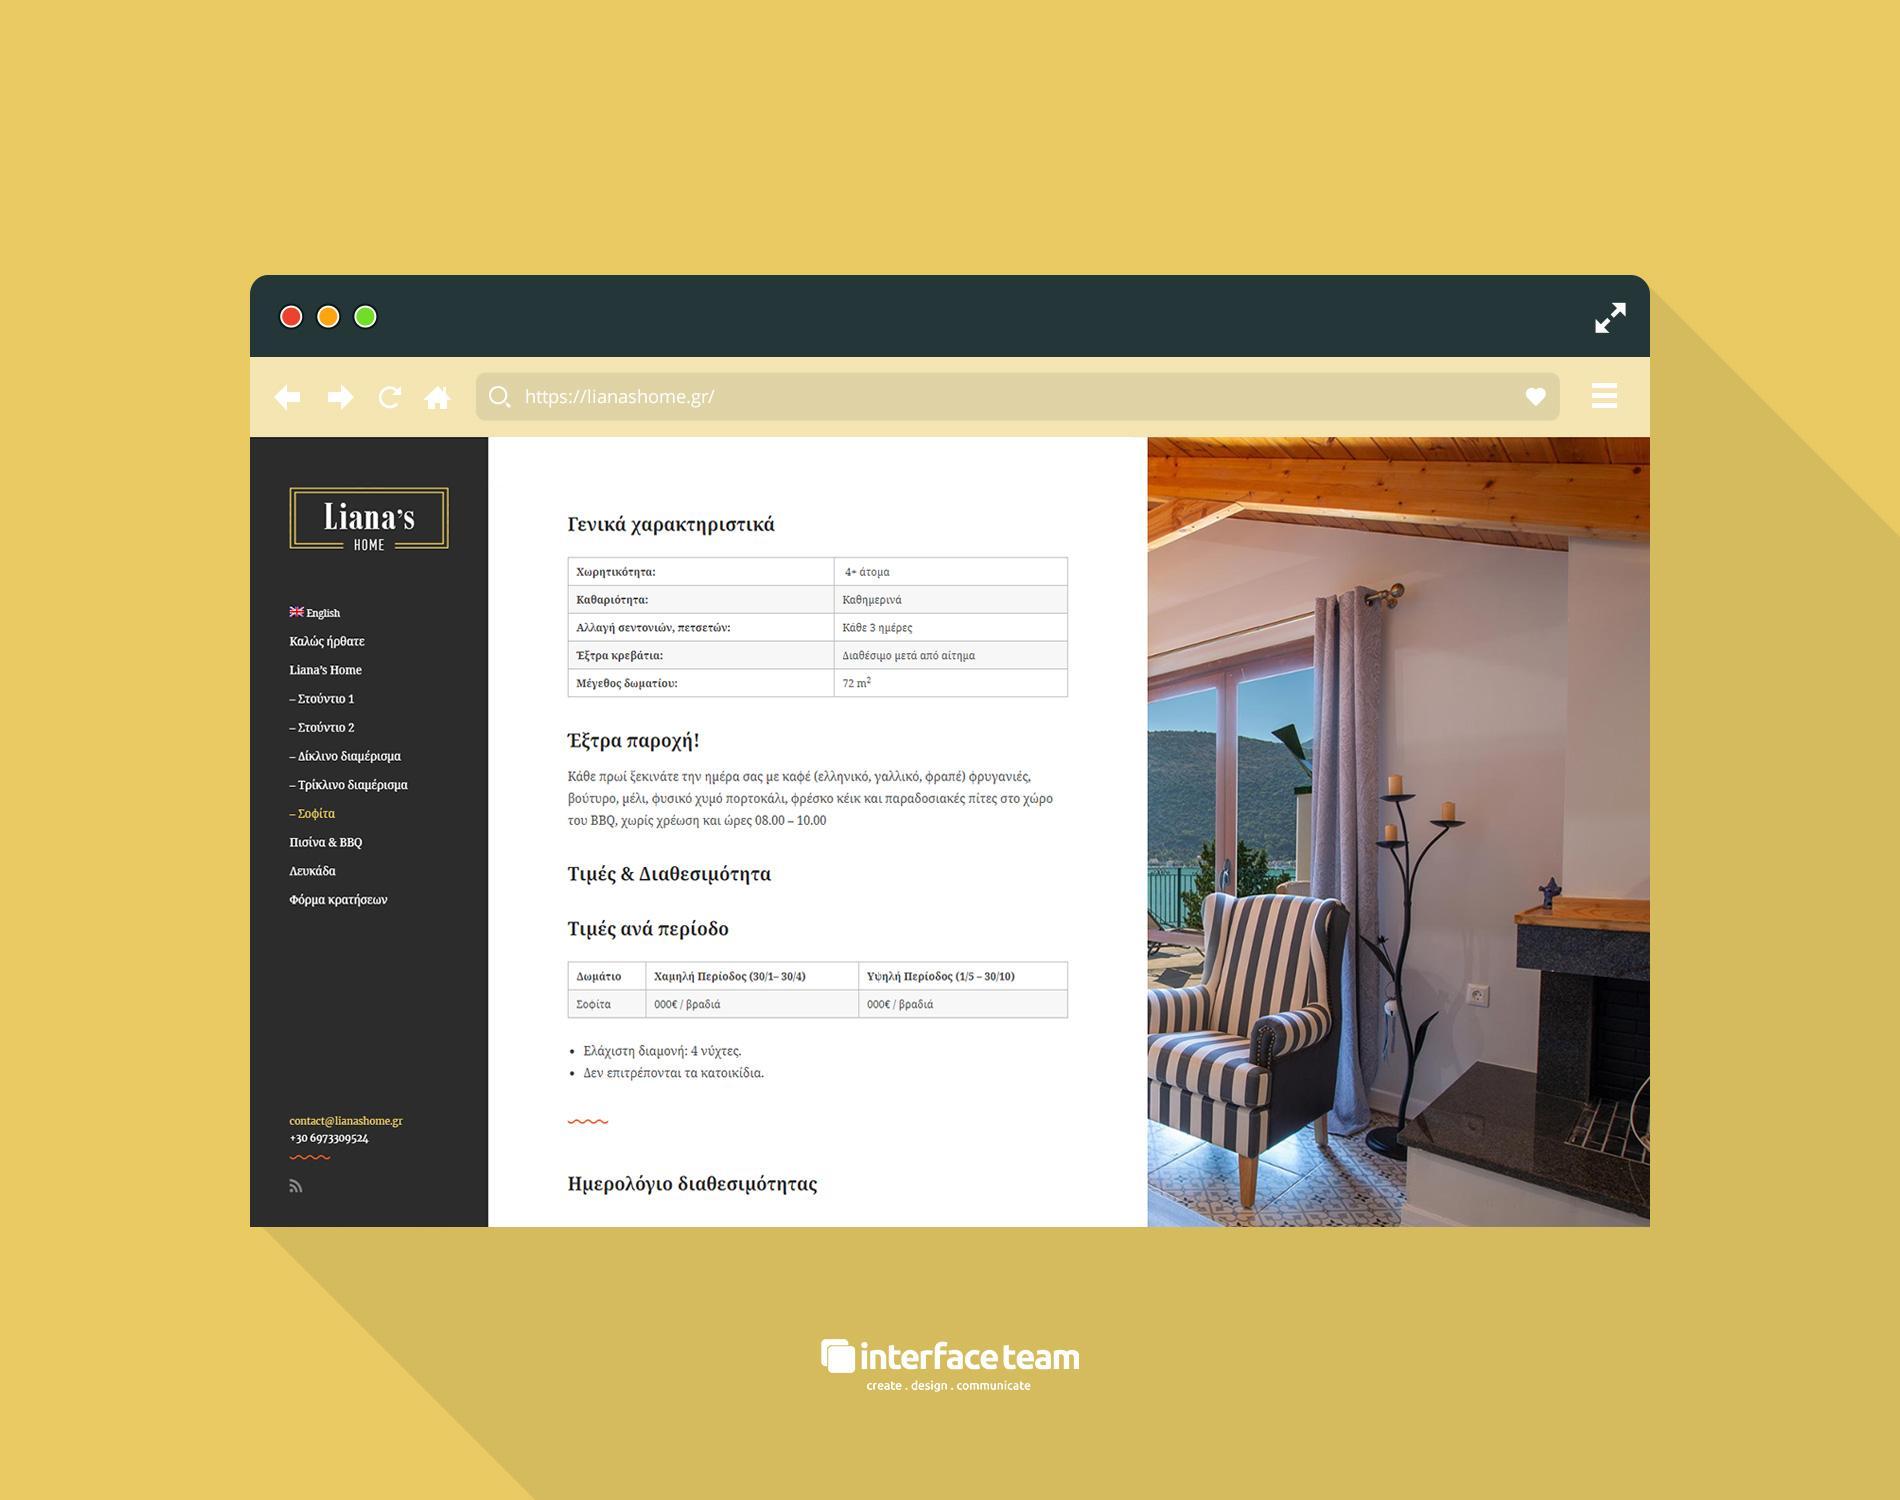 interface-team-κατασκευή-ιστοσελίδων-08